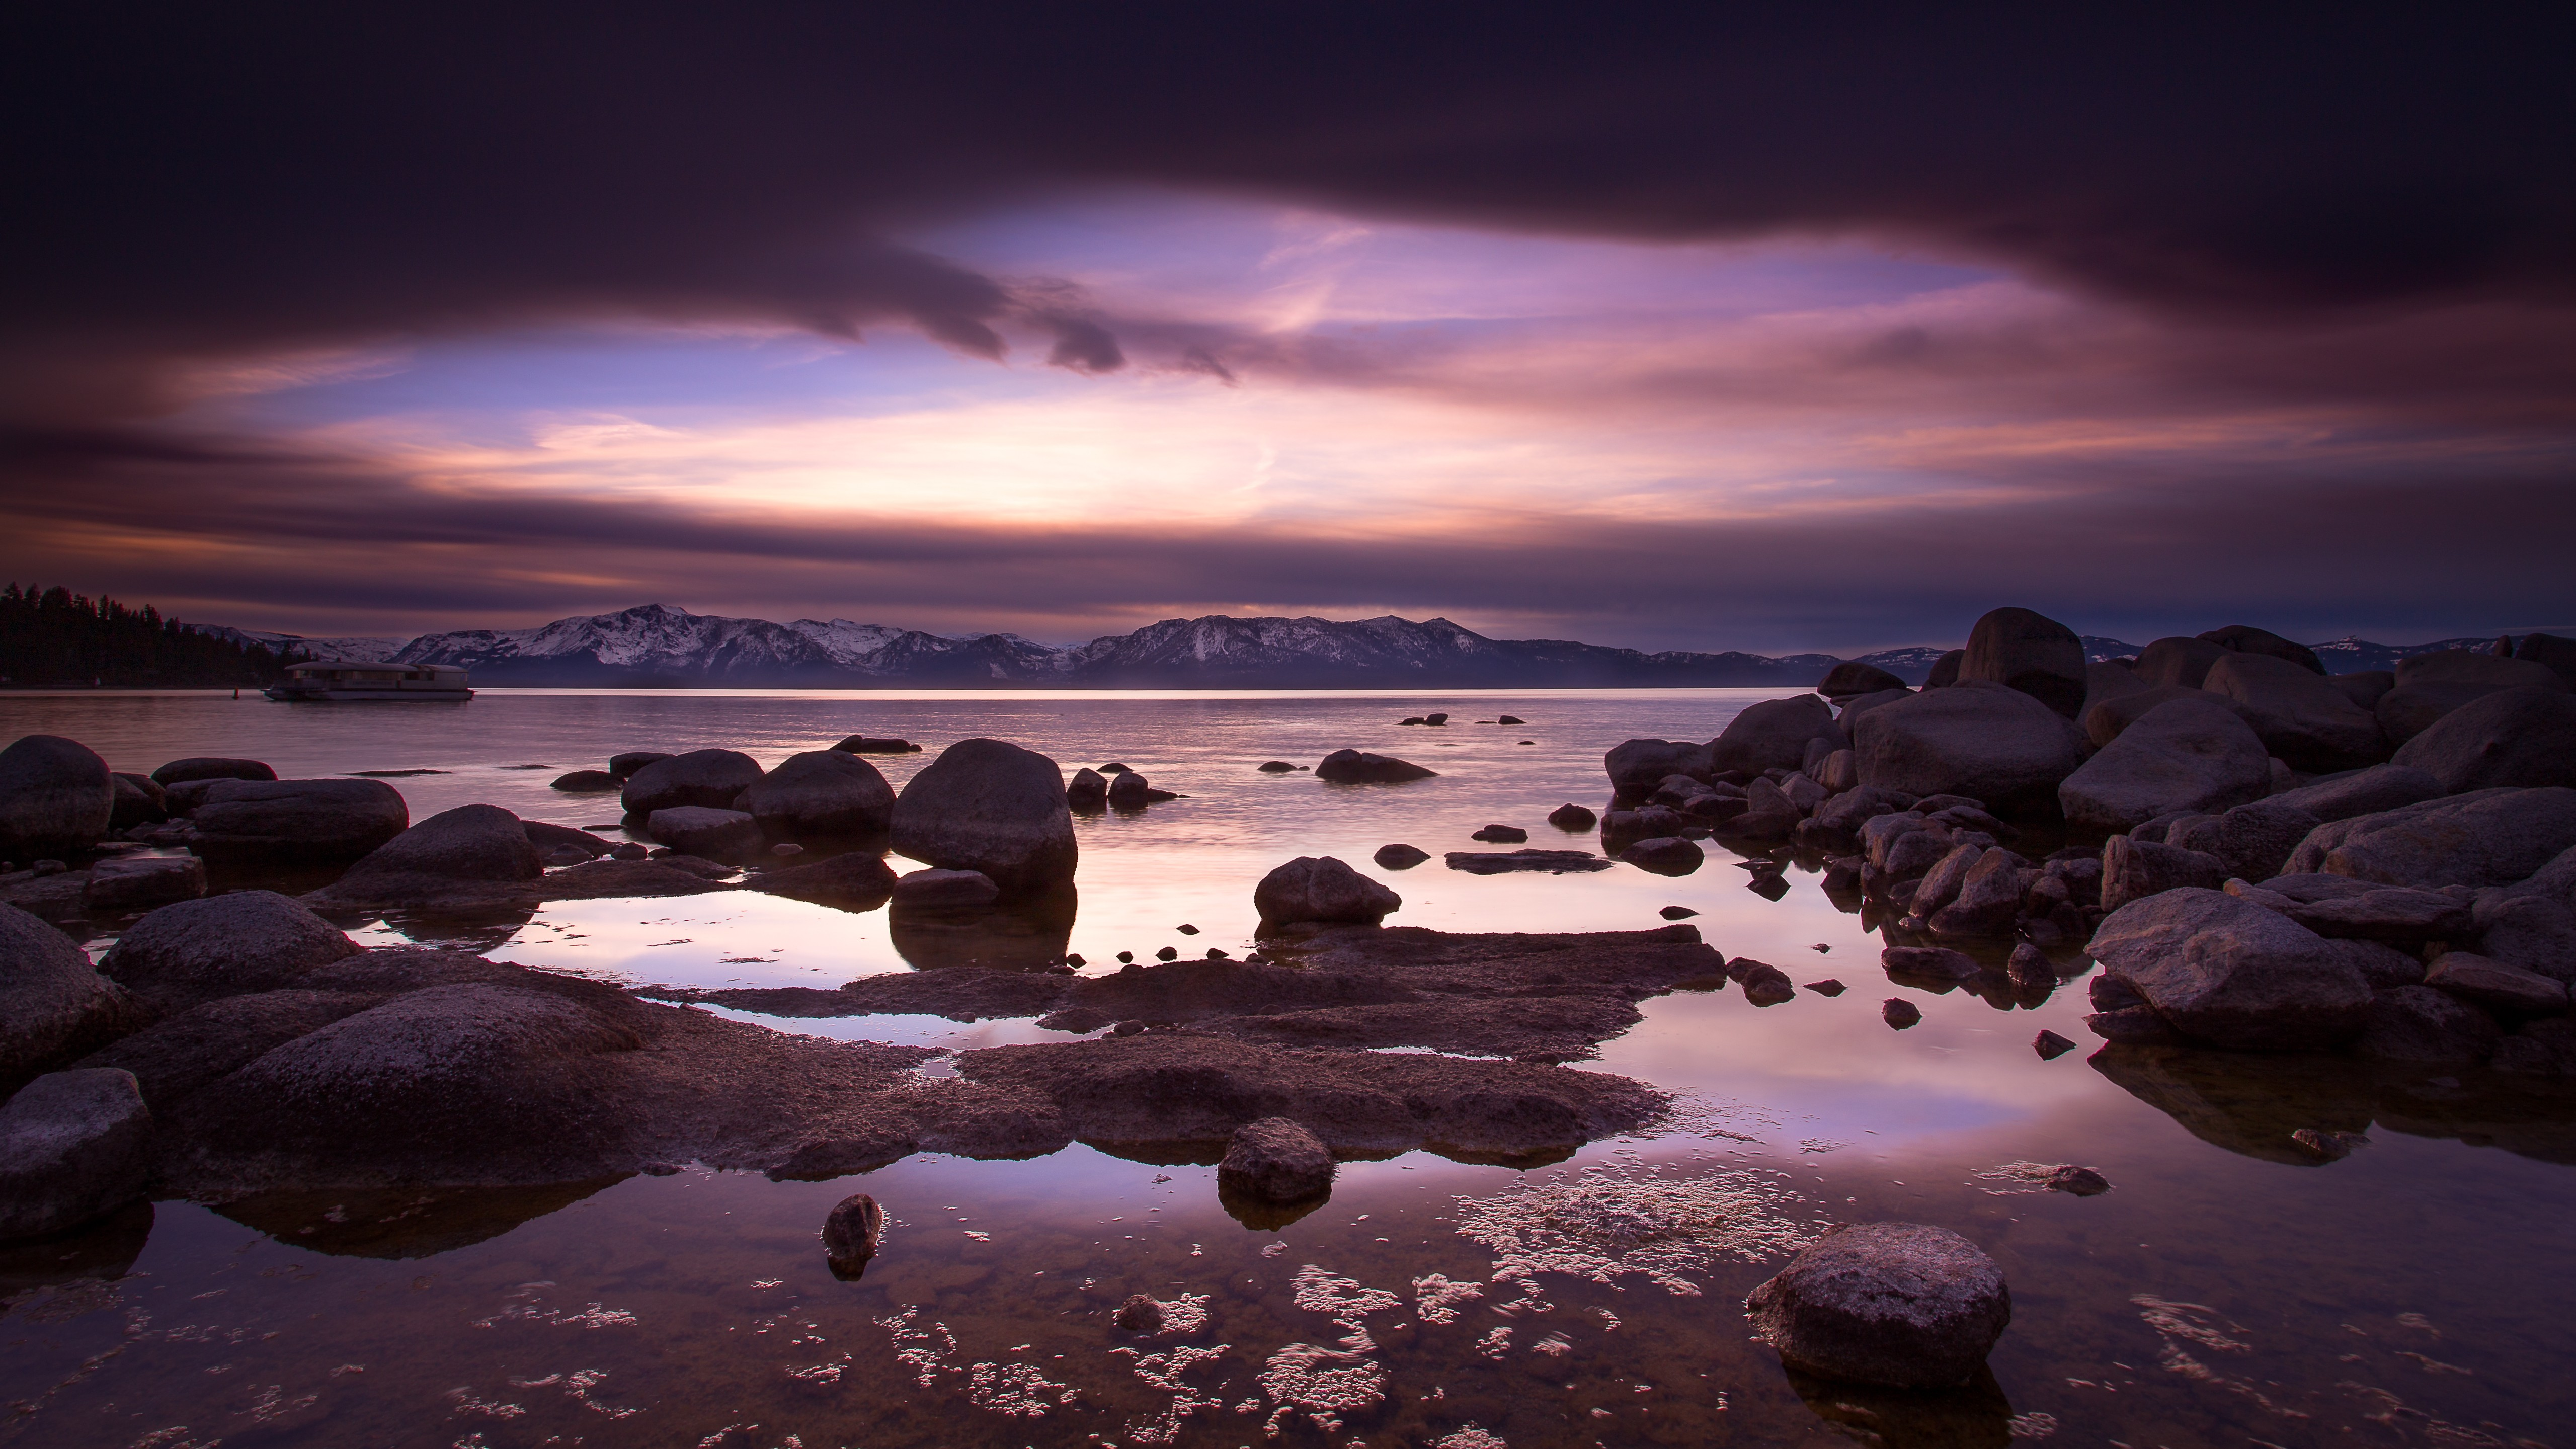 General 5120x2880 landscape water sea rock clouds